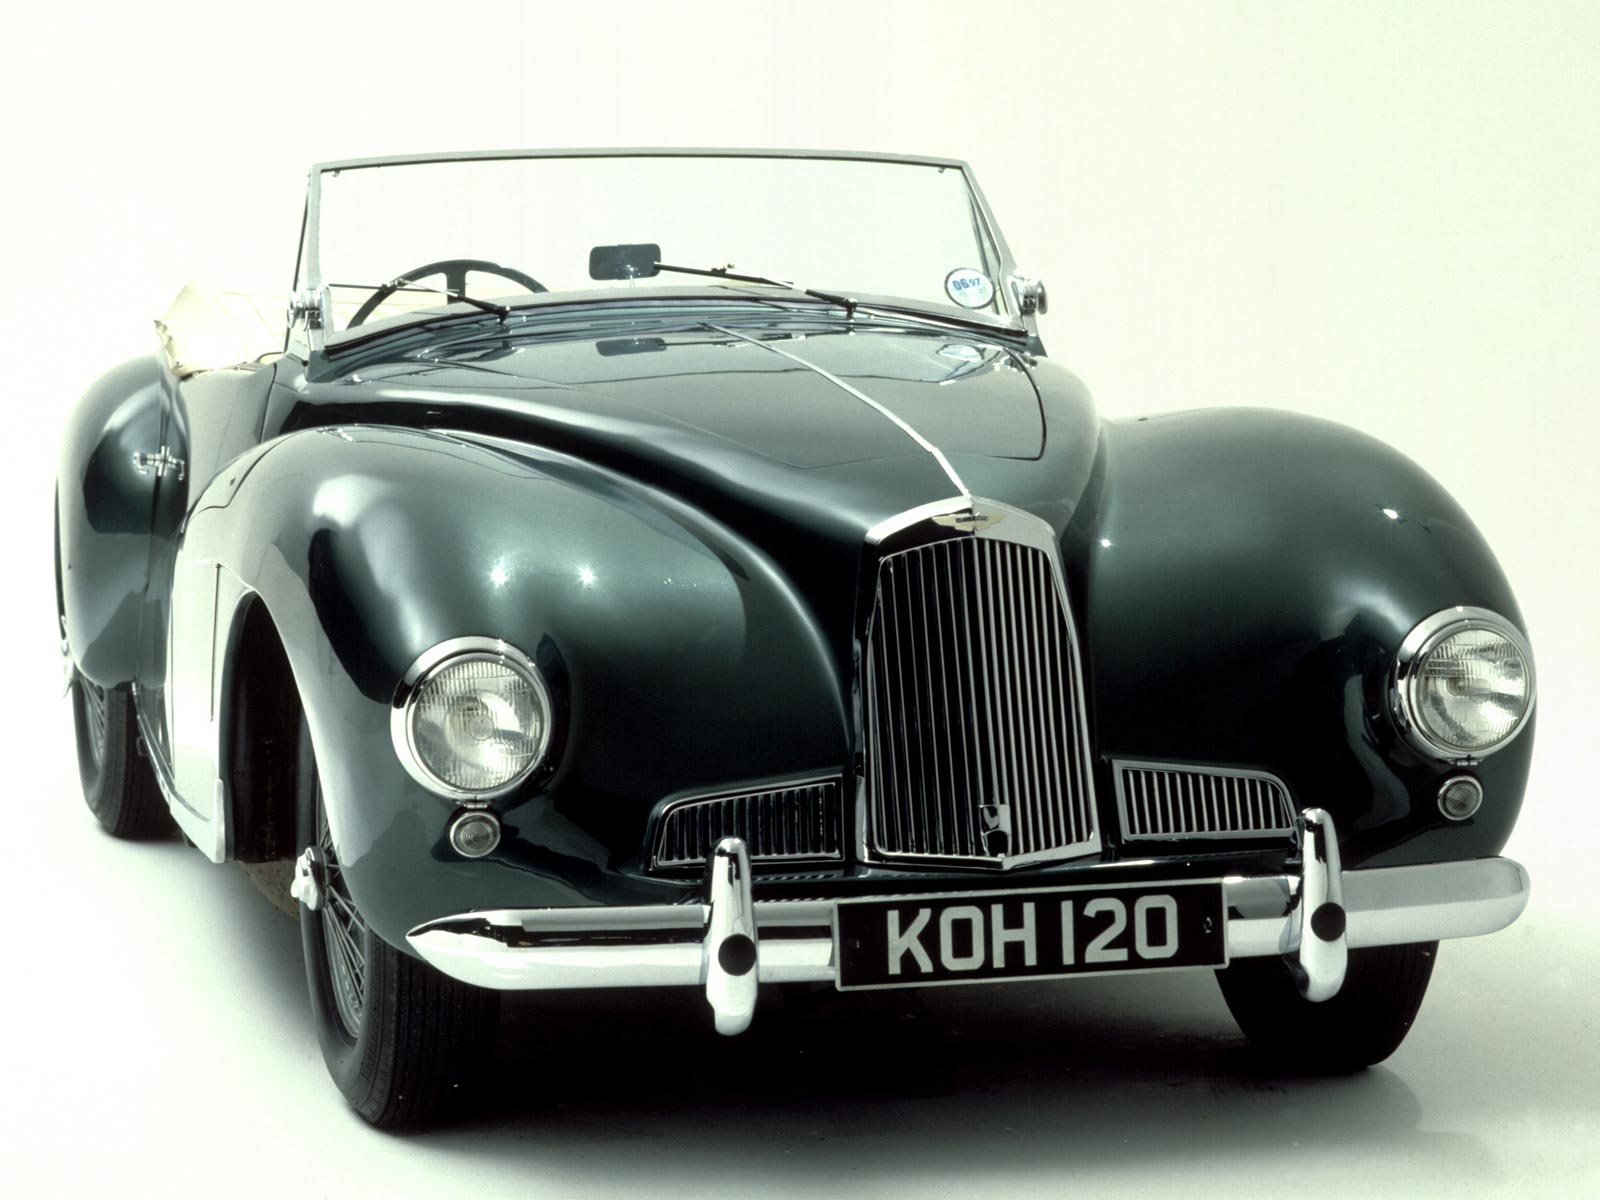 1948 1950 Aston Martin Db1 Autoguru Katalog At